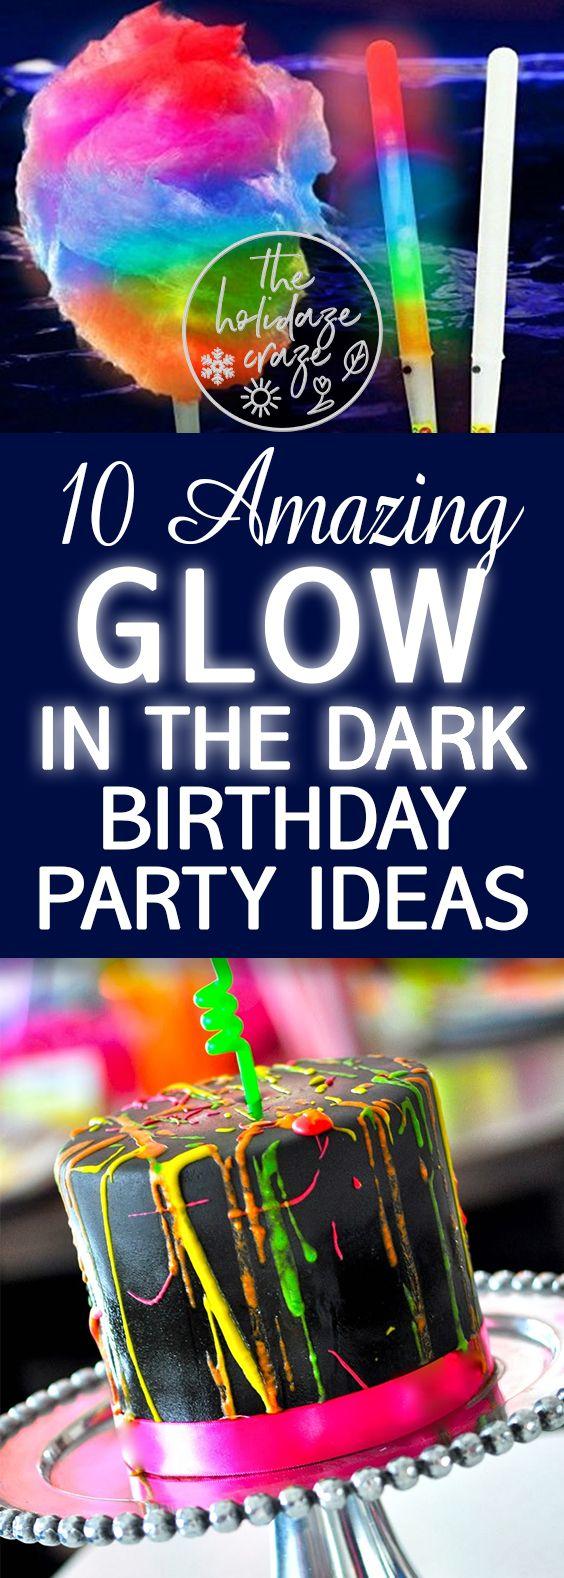 10 Amazing Glow In The Dark Birthday Party Ideas| Birthday Party Ideas, Birthday Party Themes, Birthday Party Decorations, Birthday Party Ideas for Kids, Inexpensive Birthday Party Ideas, Birthday Party Ideas for Girls, Popular Pin